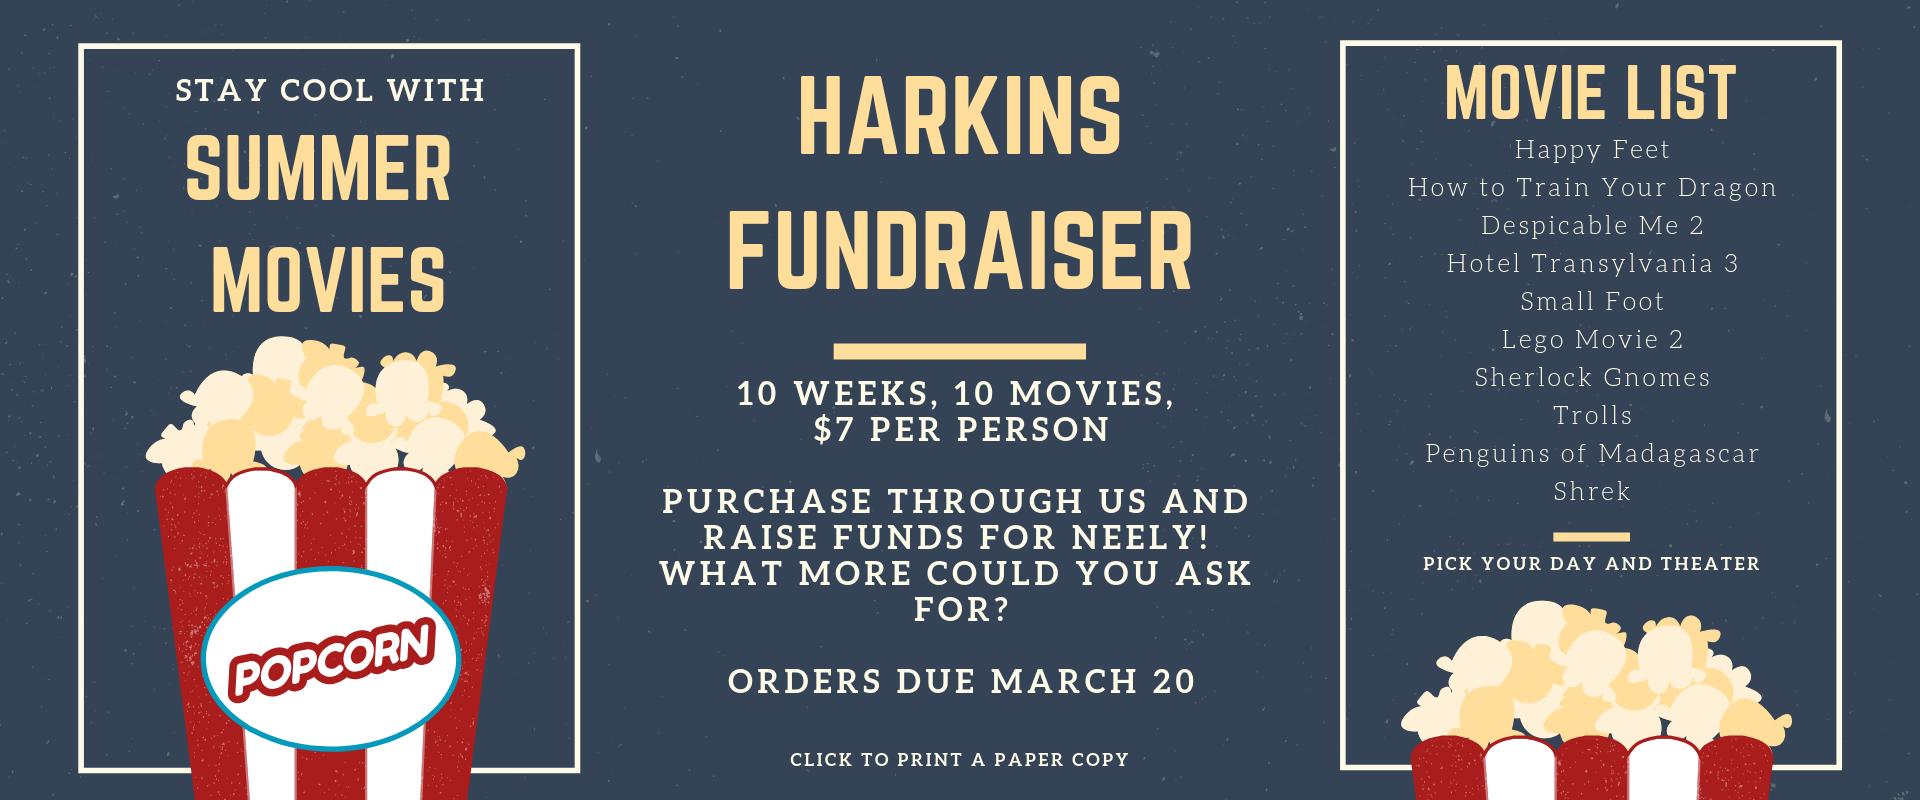 Harkins Summer Movie Fun - Due March 20 @3:30pm